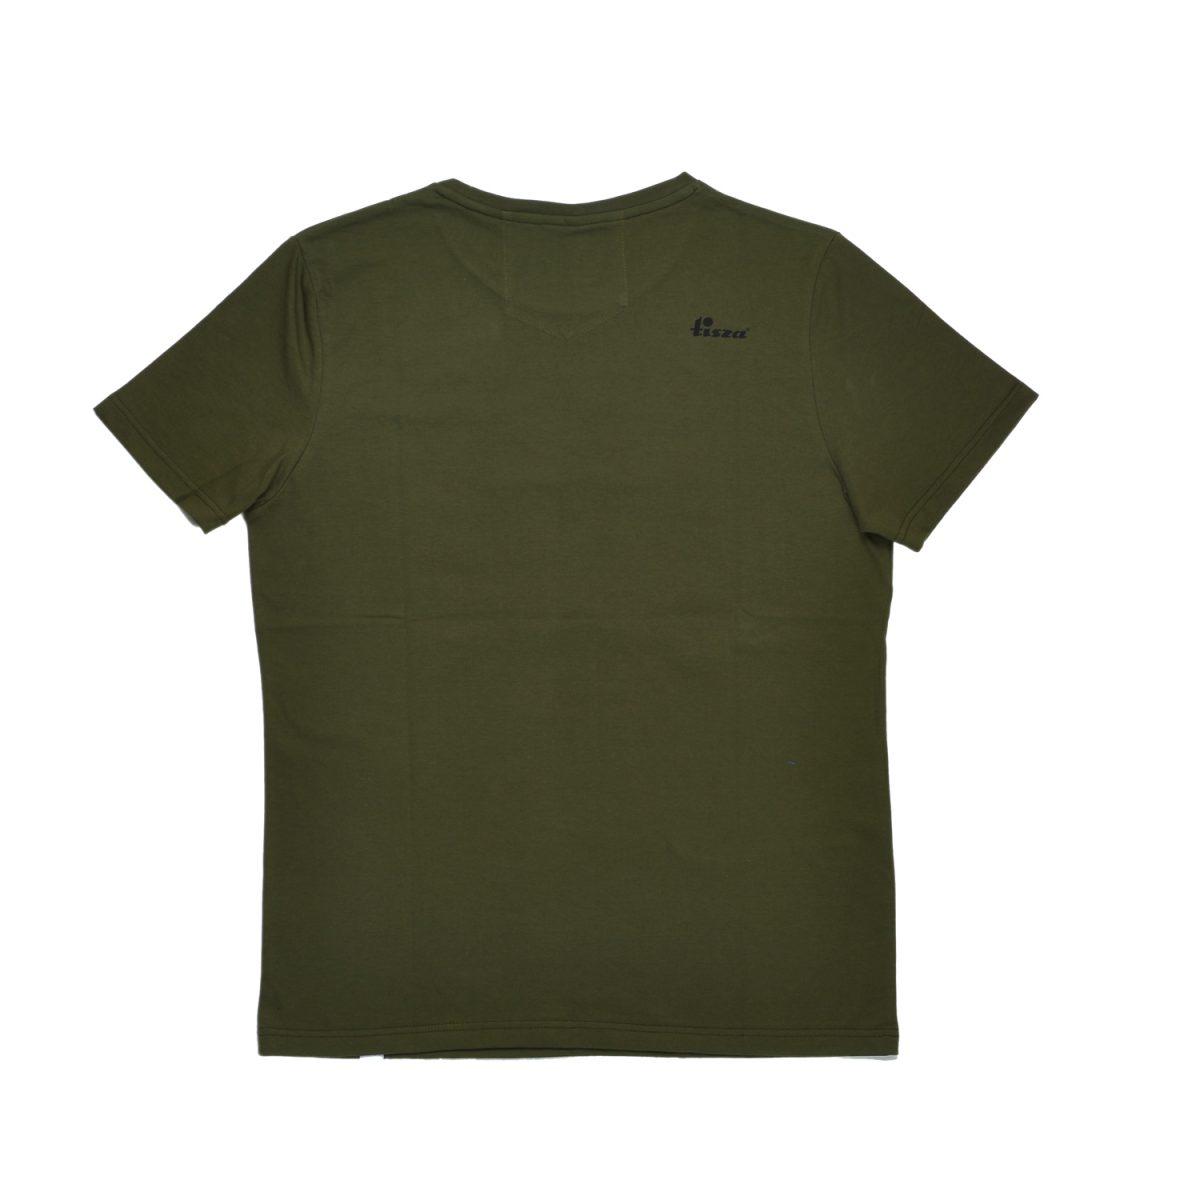 Tisza shoes - T-shirt - Khaki T-logo